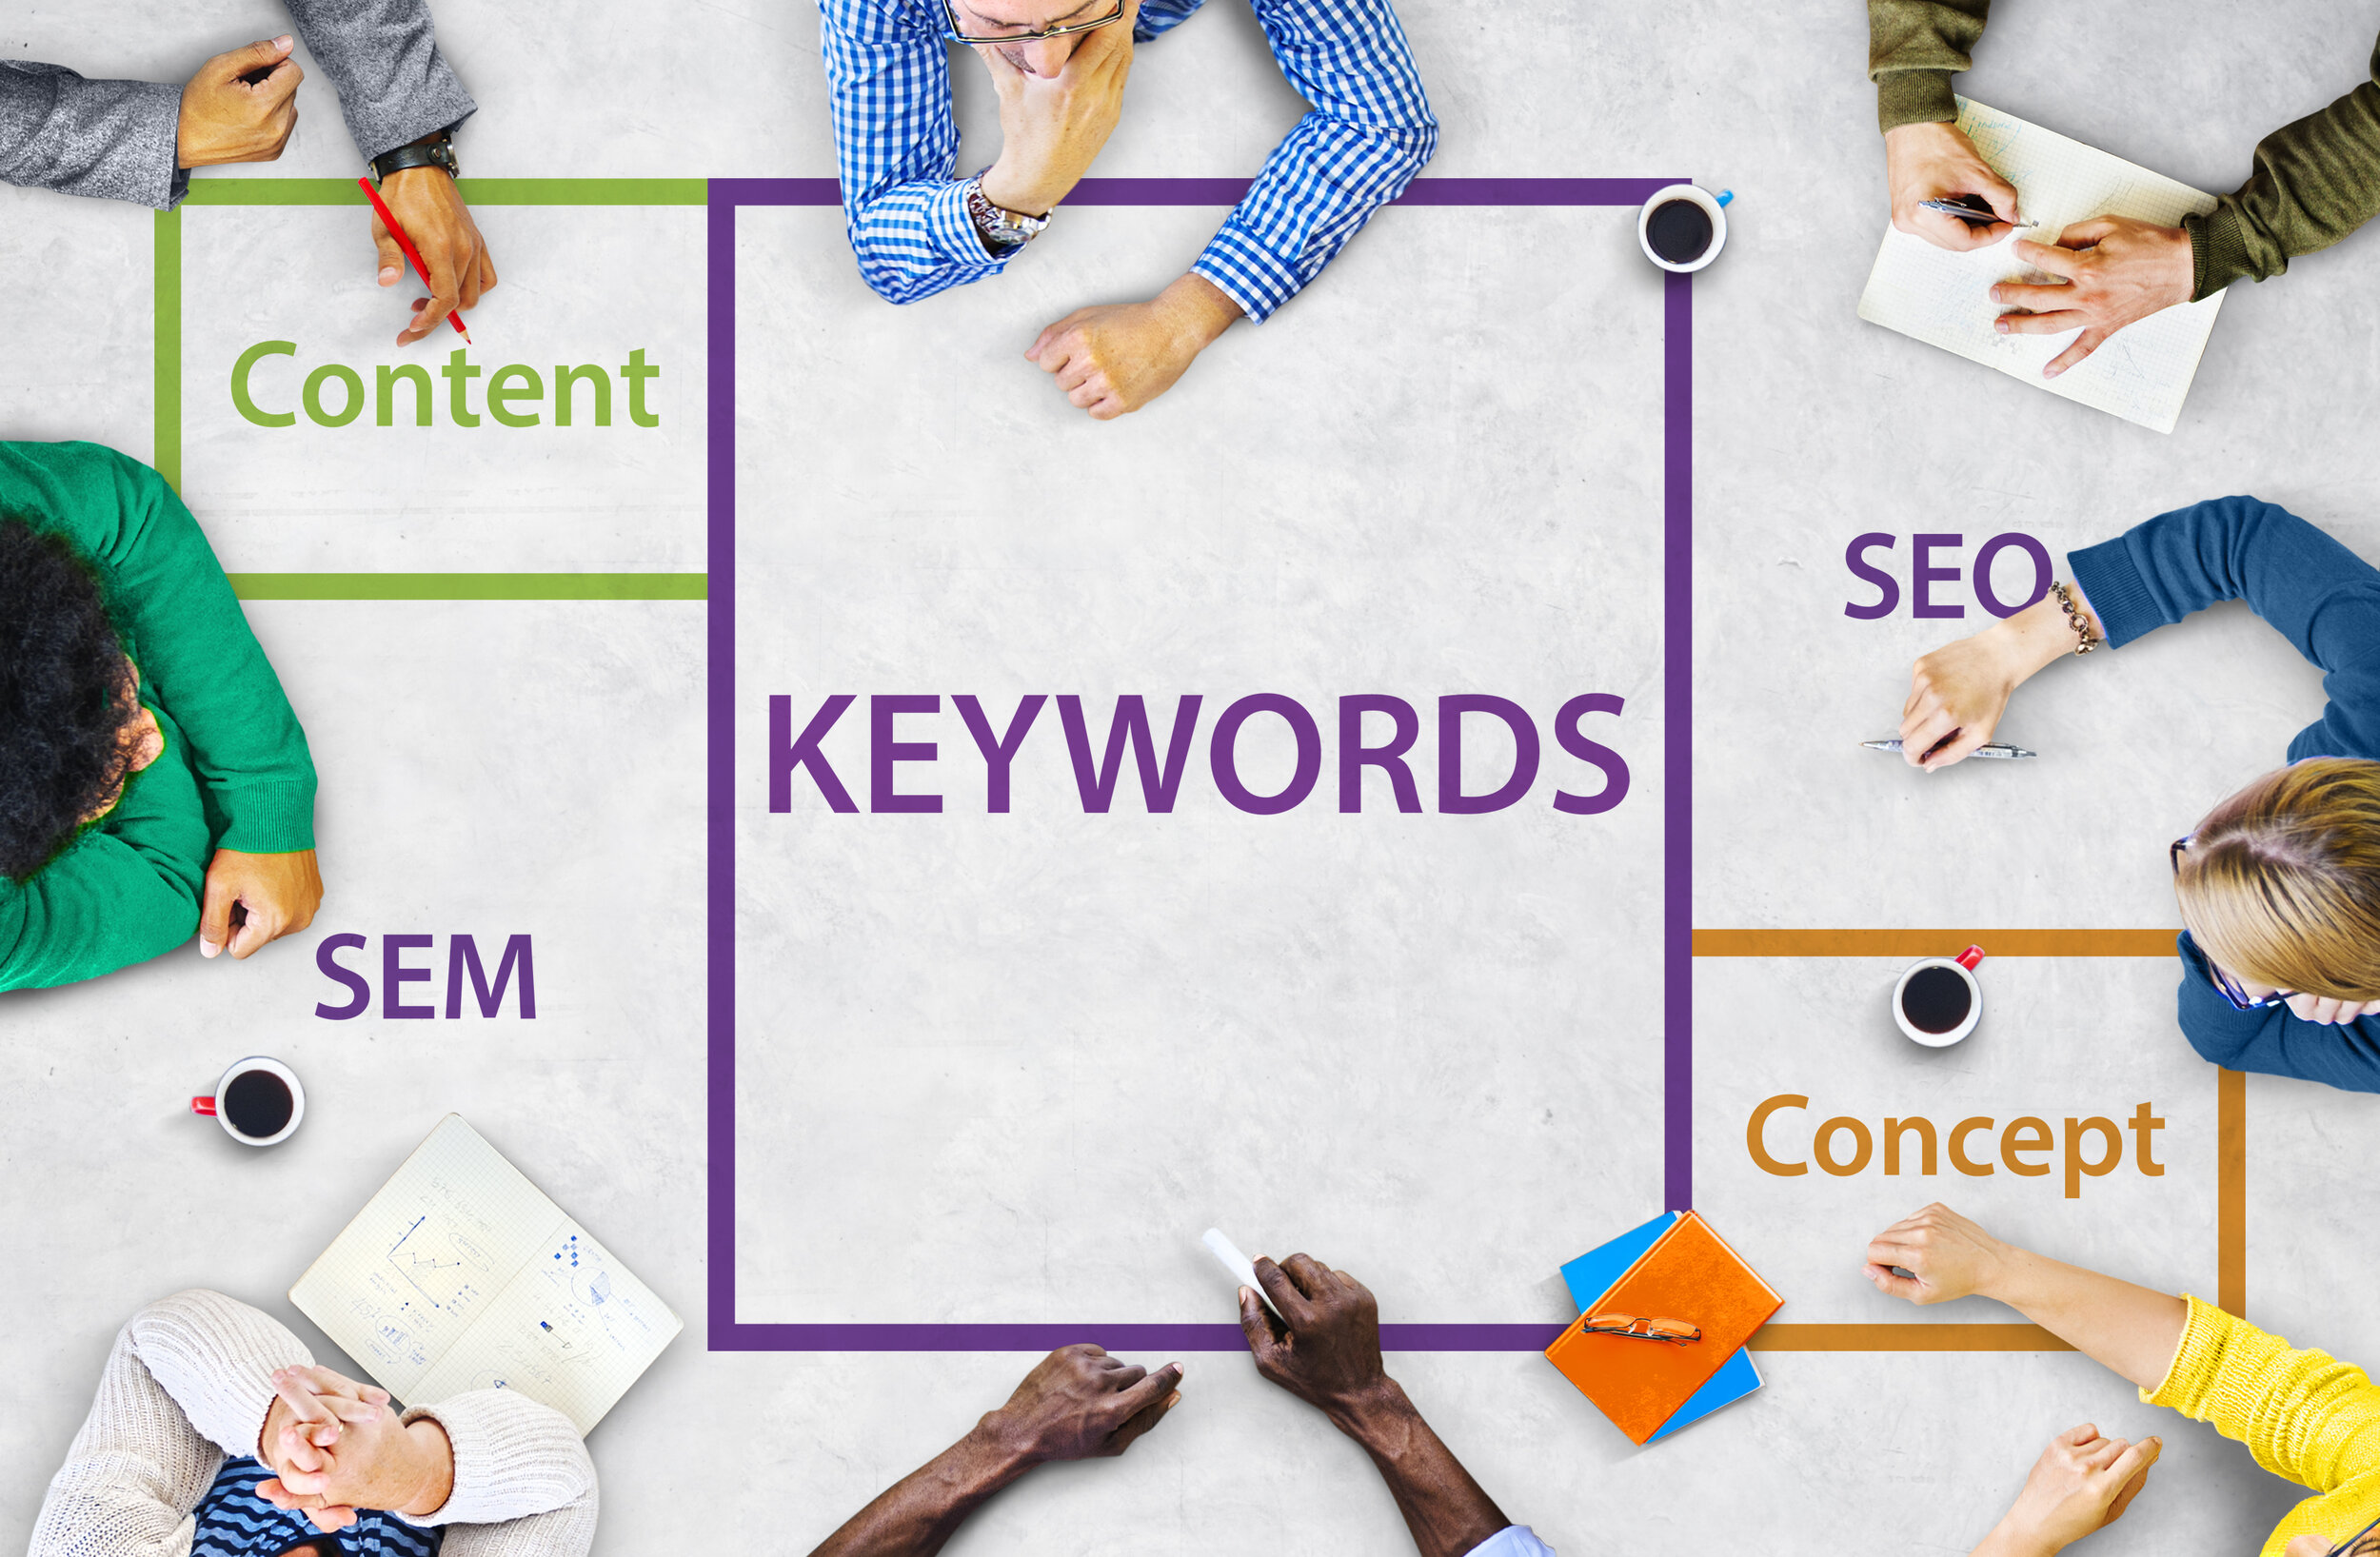 Keywords .jpg